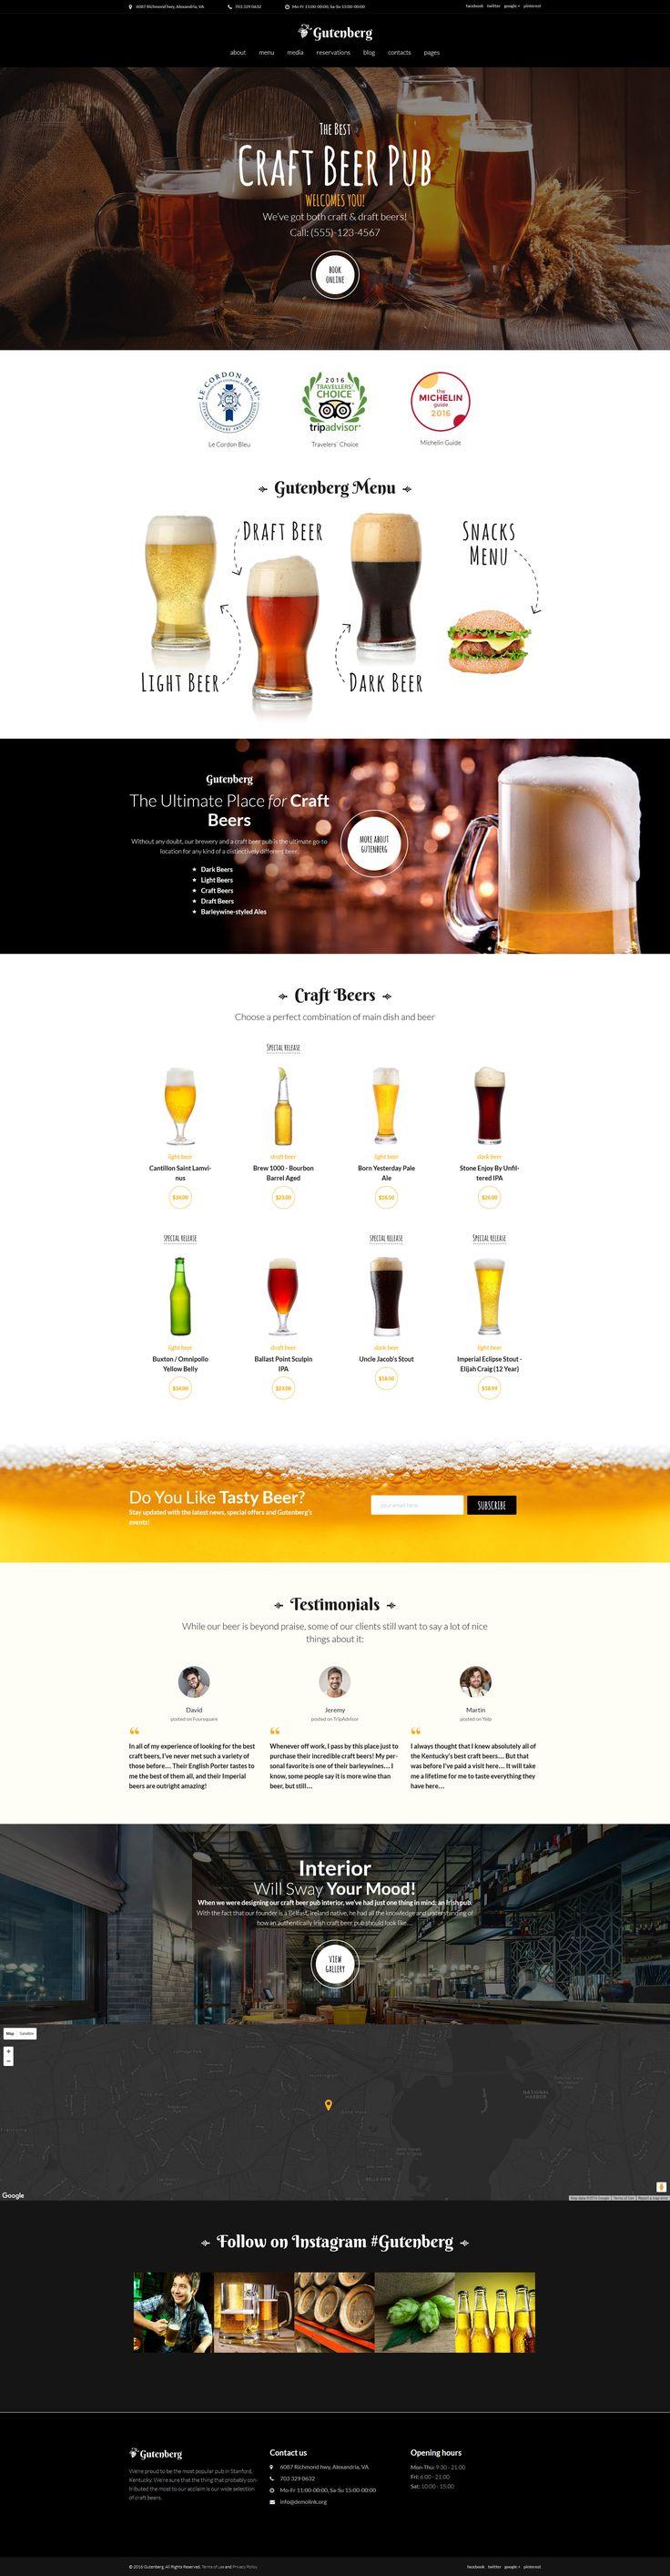 GutenBerg is a fully editable responsive WordPress theme intended for bringing beer restaurants and taverns on the web.   #wordpress #webdesign #beer #pub #restaurant  https://www.templatemonster.com/wordpress-themes/gutenberg-beer-pub-and-brewery-wordpress-theme-59005.html